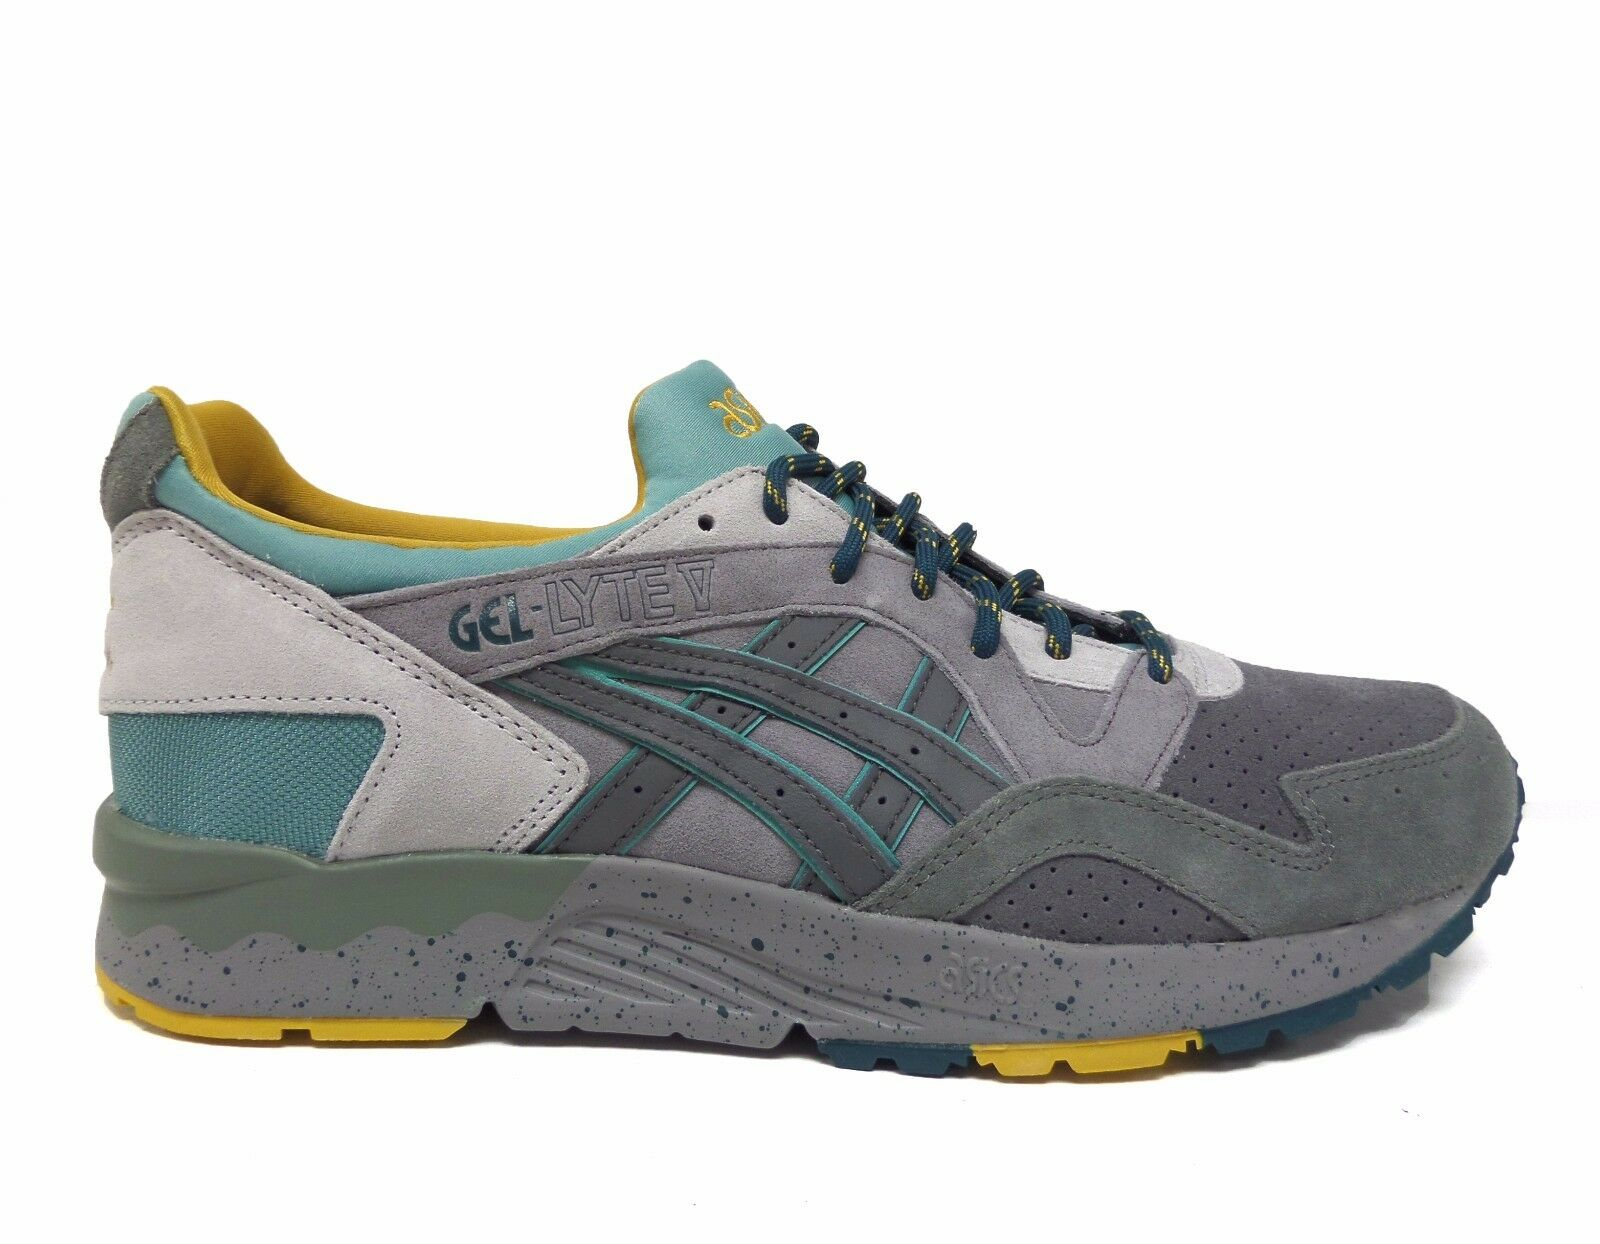 Asic / uomini gel-lyte / alluminio / Asic carbonio scarpe da corsa h7j4l-9697 b caf0c7